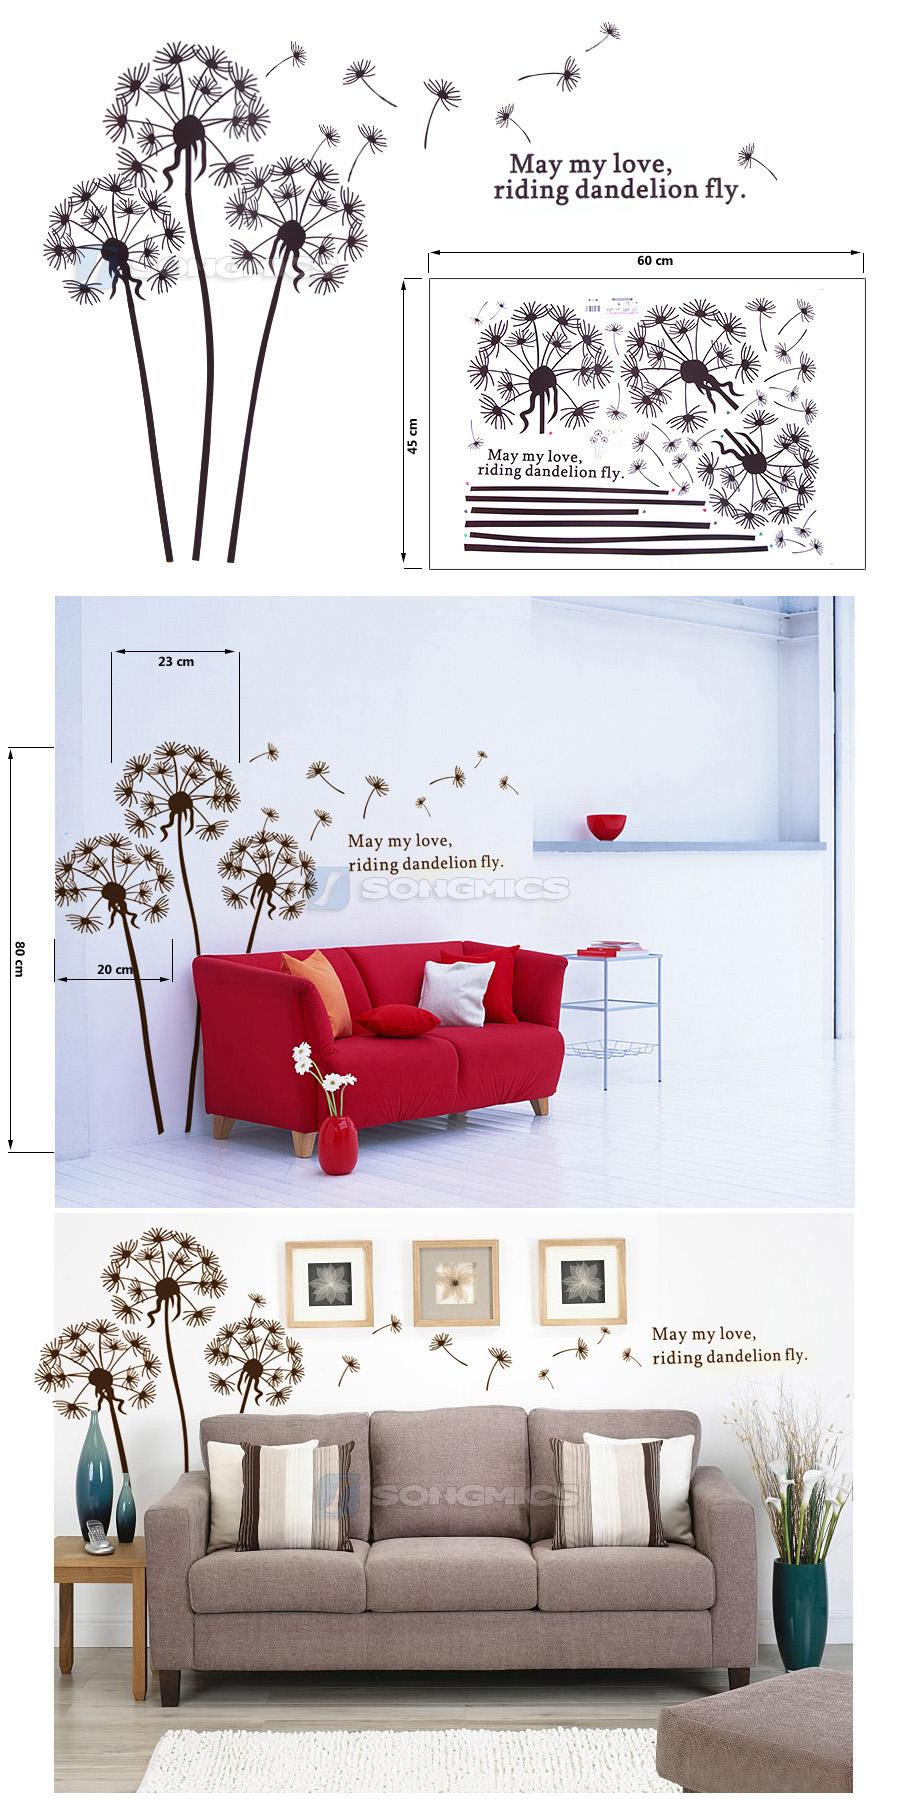 songmics l wenzahn pusteblume wandtattoo wandaufkleber schlafzimmer braun fwt03k ebay. Black Bedroom Furniture Sets. Home Design Ideas